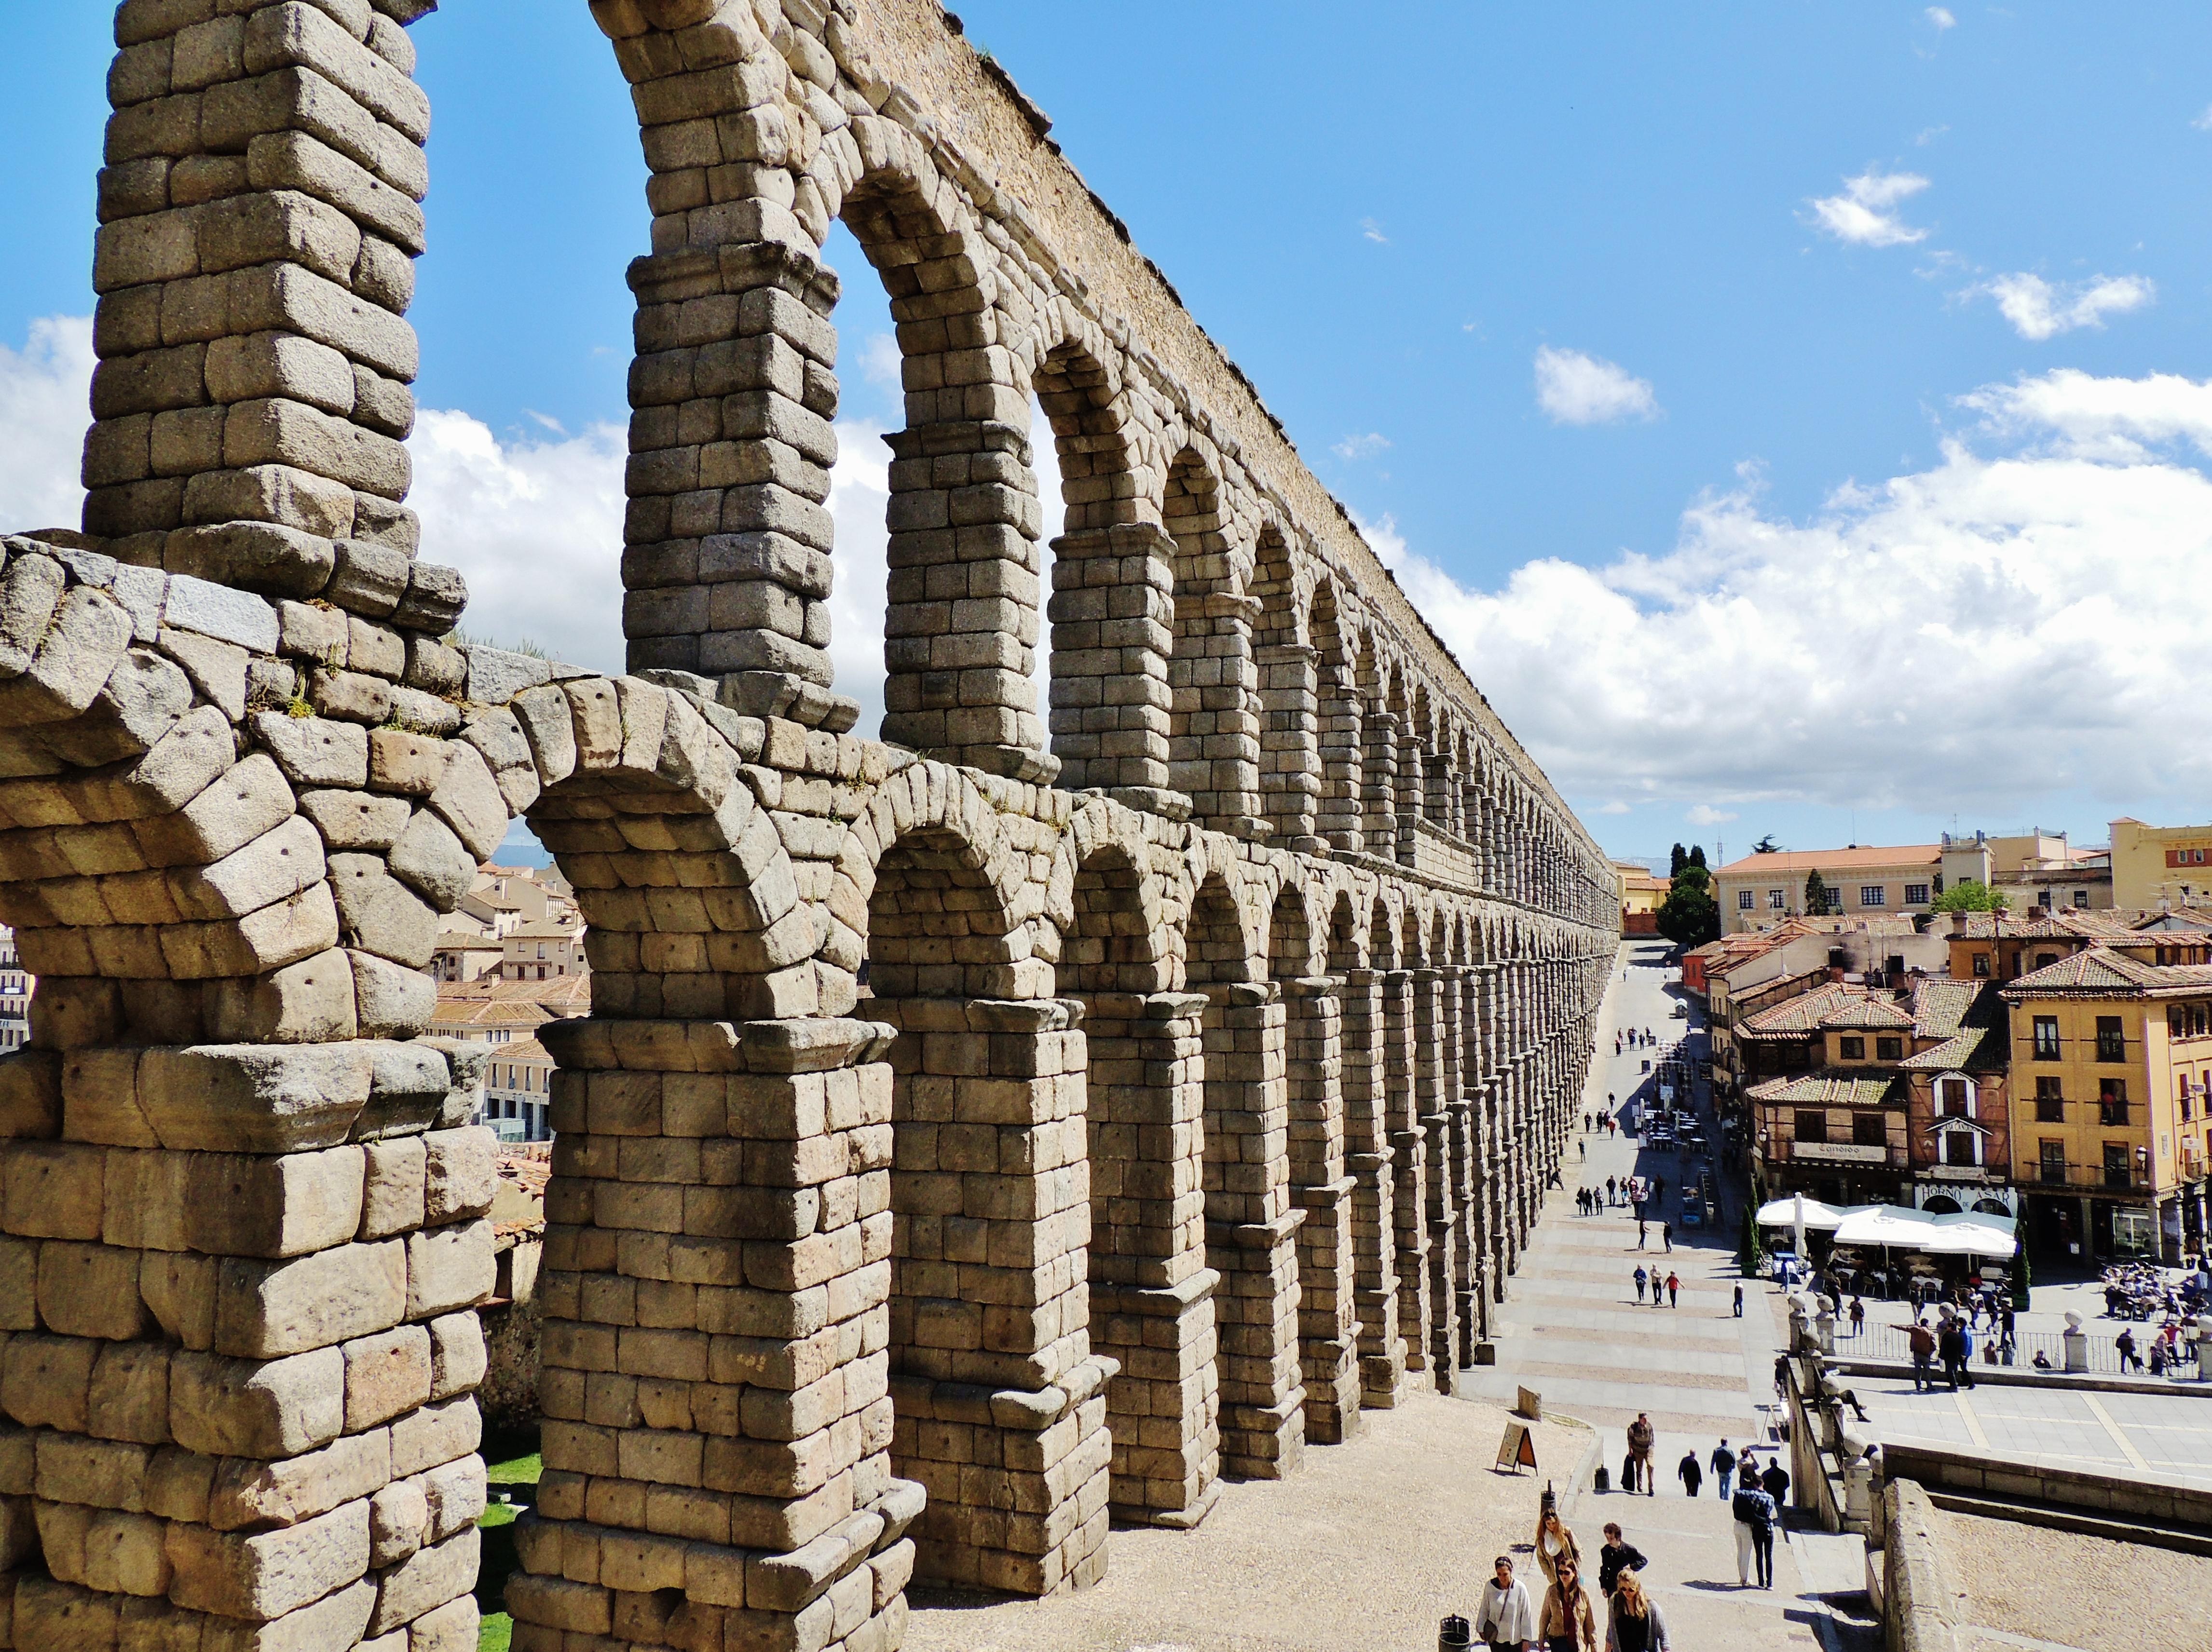 File:Aqueduct of Segovia, Segovia, Spain, April 2015.jpg ...